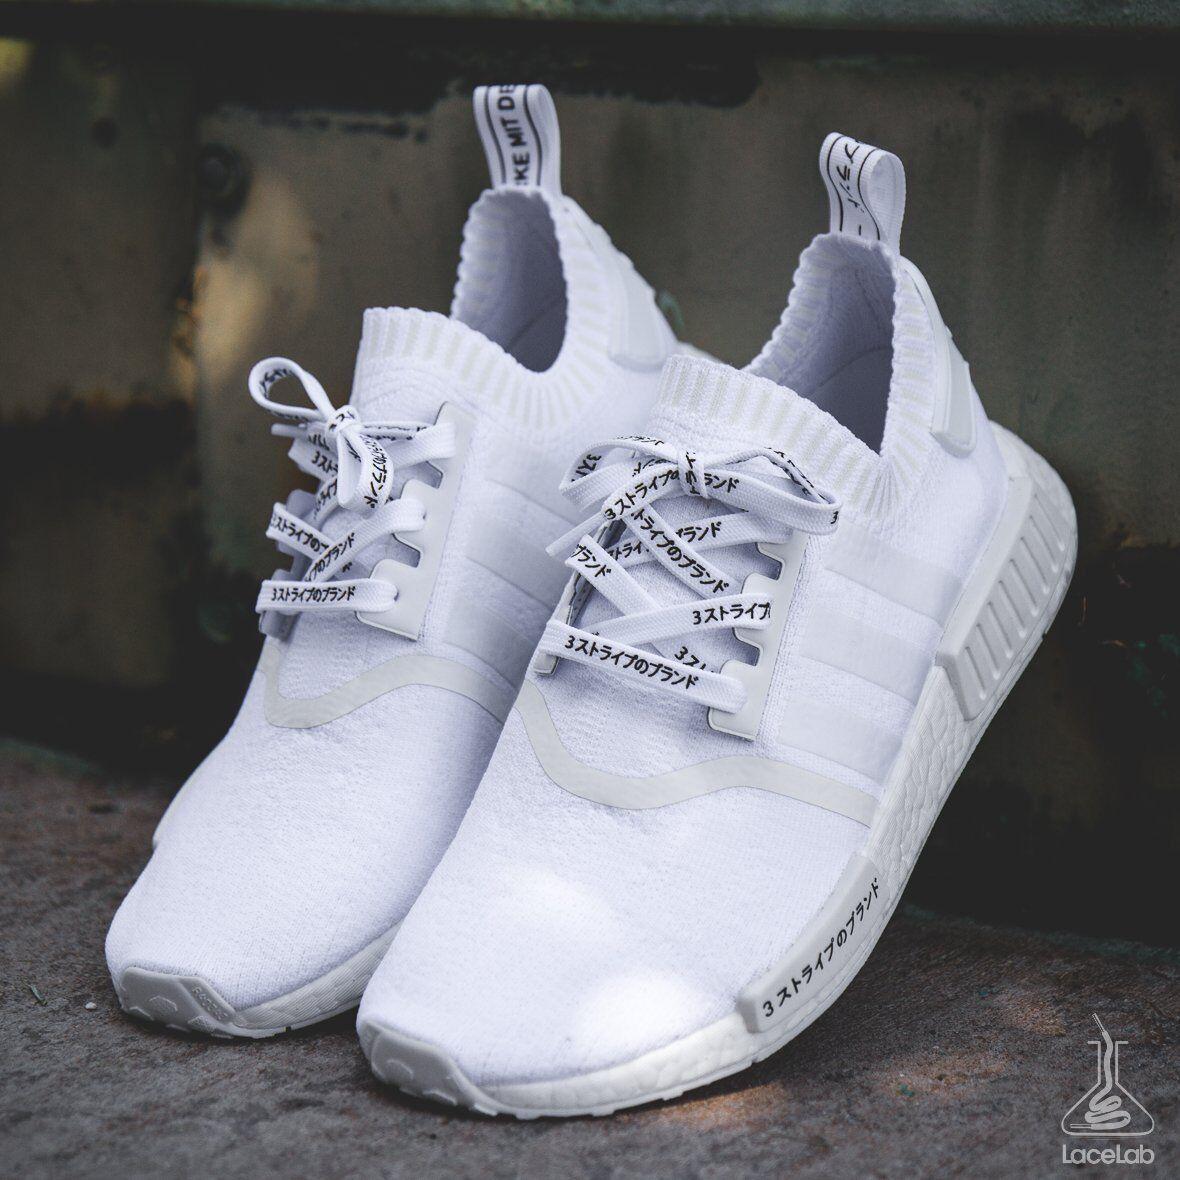 "NMD Shoelaces Ultra Boost Laces ""3 Stripes"" Katakana Flat White 41″ LACE ENVY Clothing & Shoe Care"